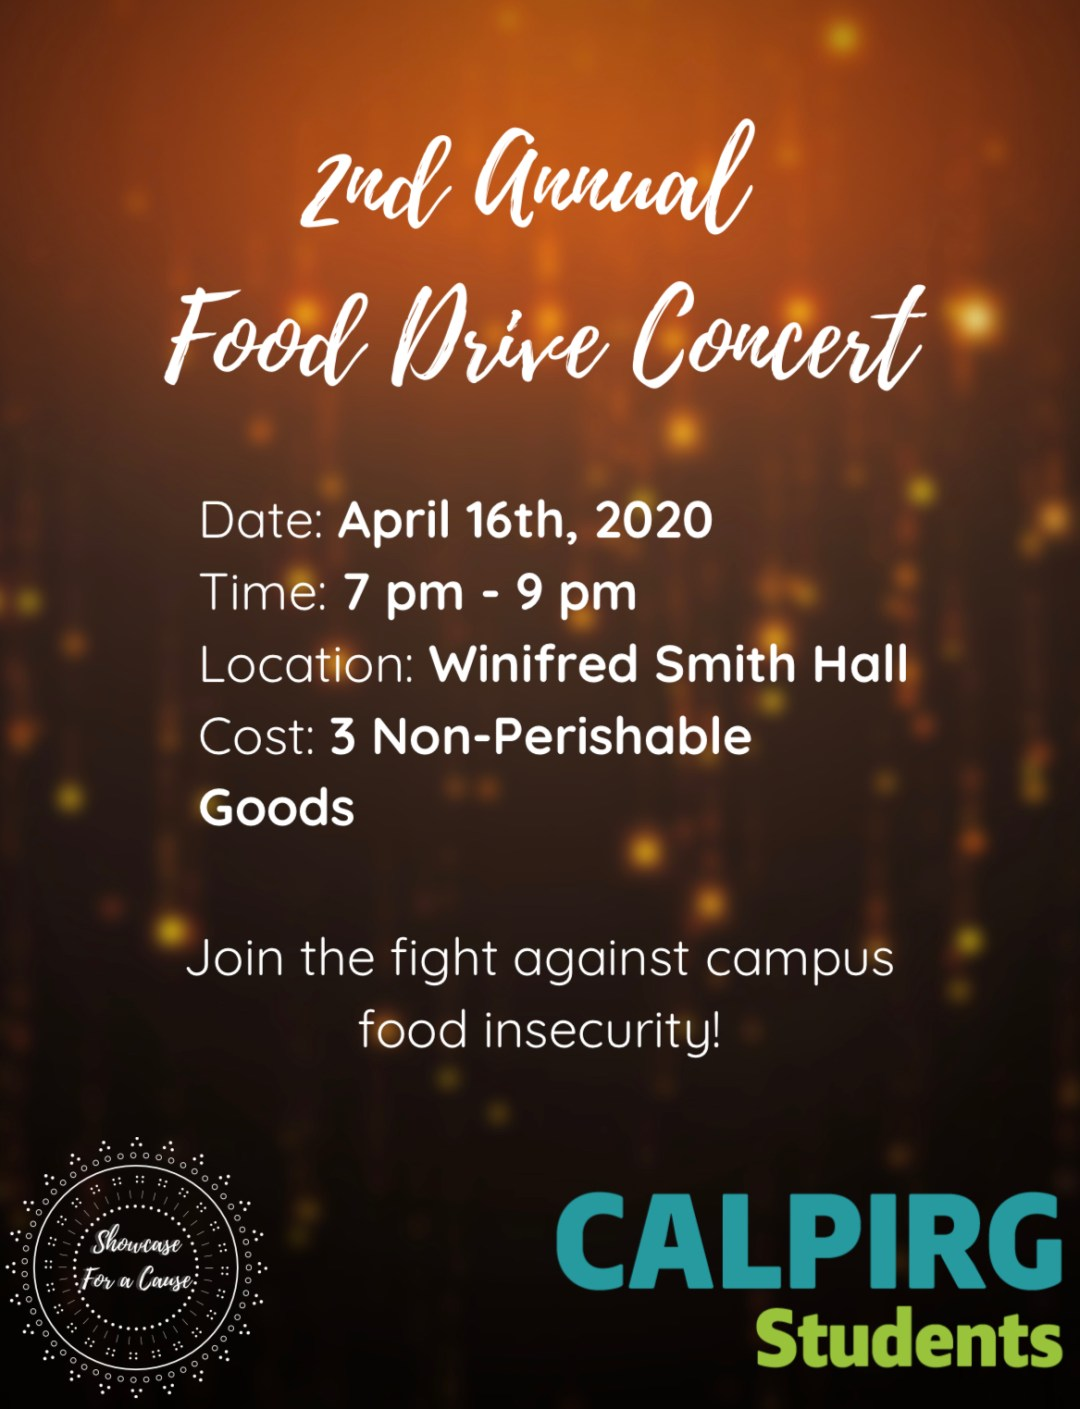 CALPIRG Food Drive Concert at UCI